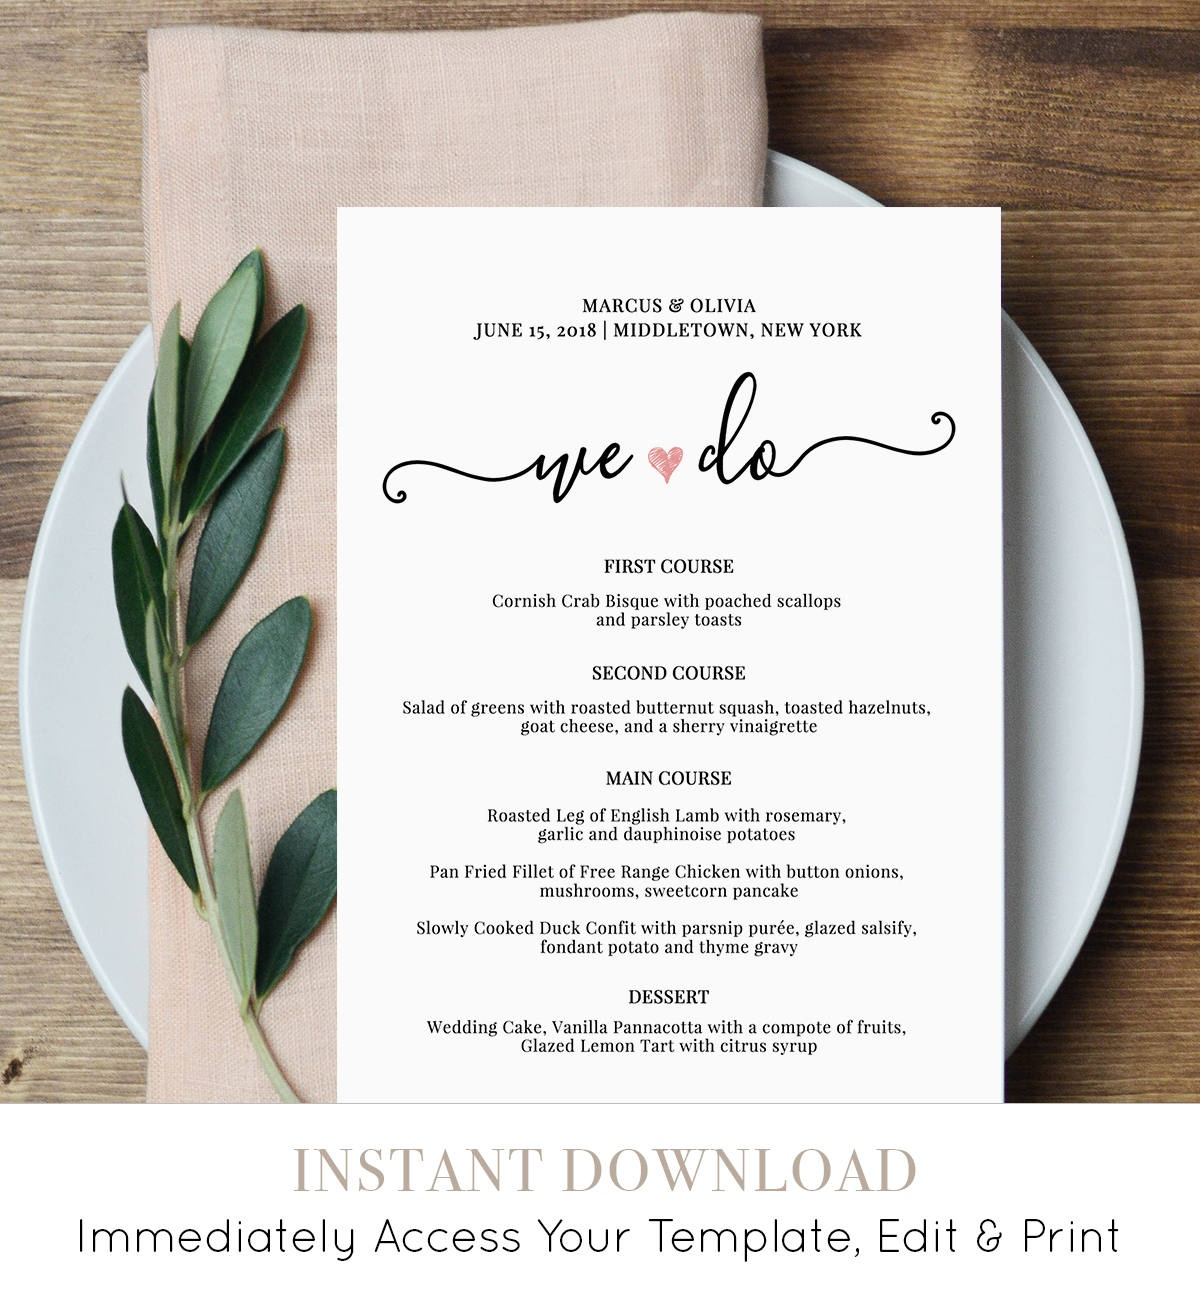 Wedding Menu Card Template, We Do, Printable Dinner Menu, Heart - Free Printable Wedding Menu Card Templates